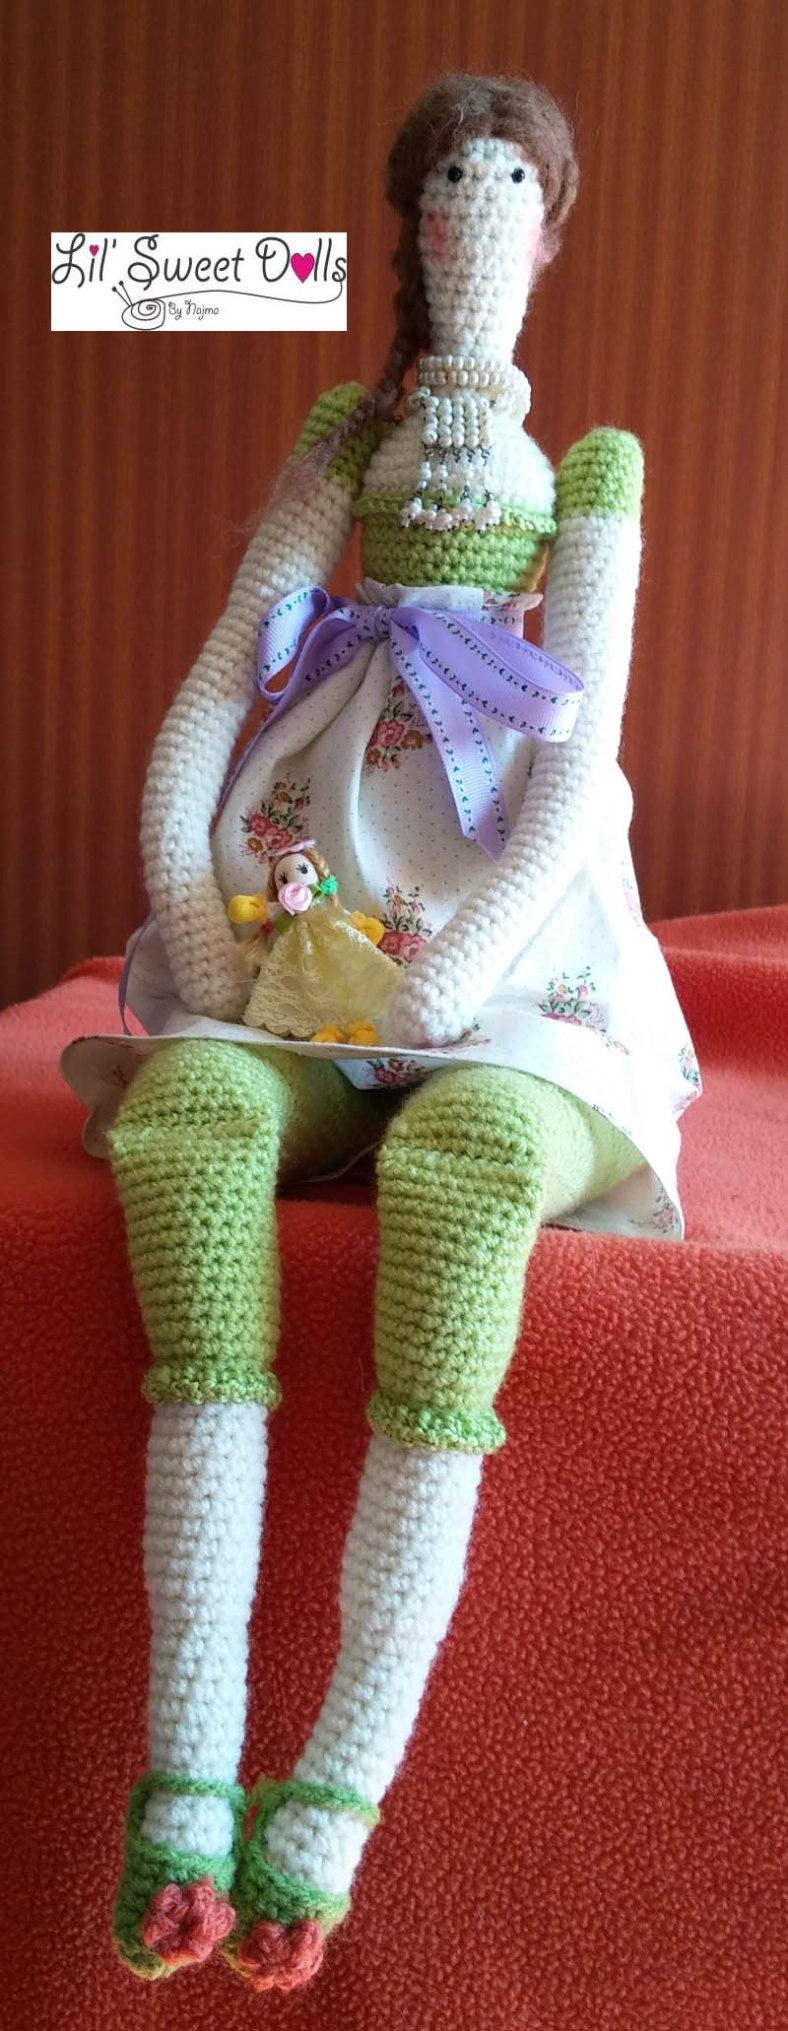 tilda crochet ganchillo doll  amigurumi 01